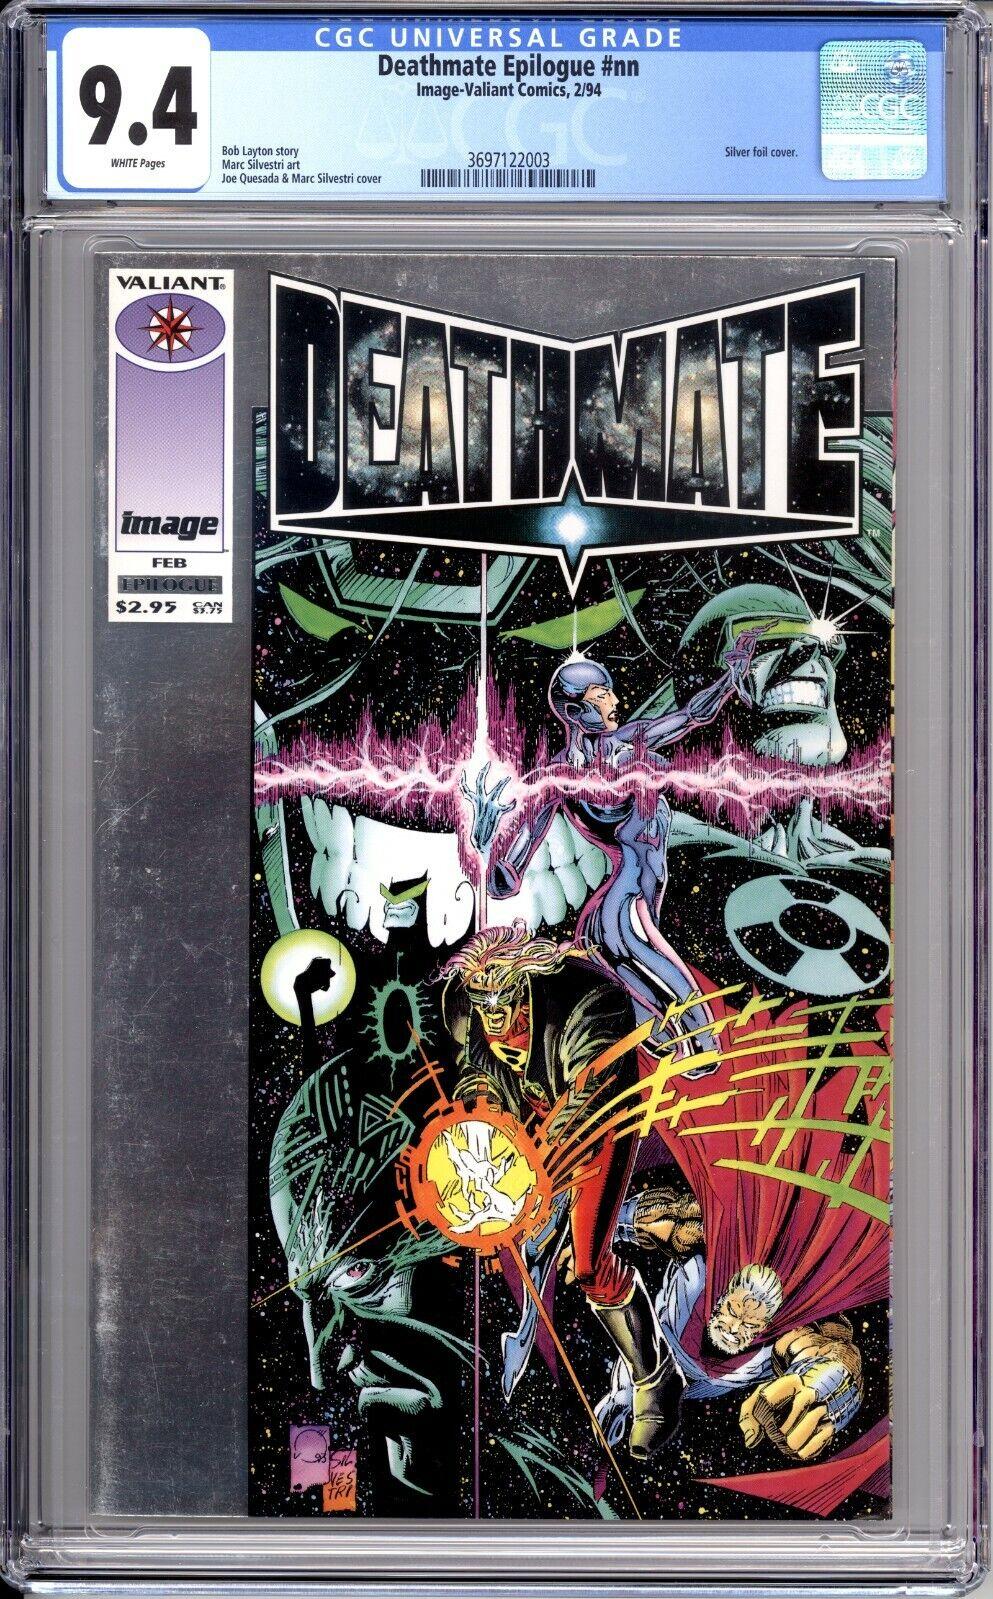 Image Valiant Deathmate Epilogue 1994 Graded 9.4 CGC CBCS Silvestri Layton  - $29.99